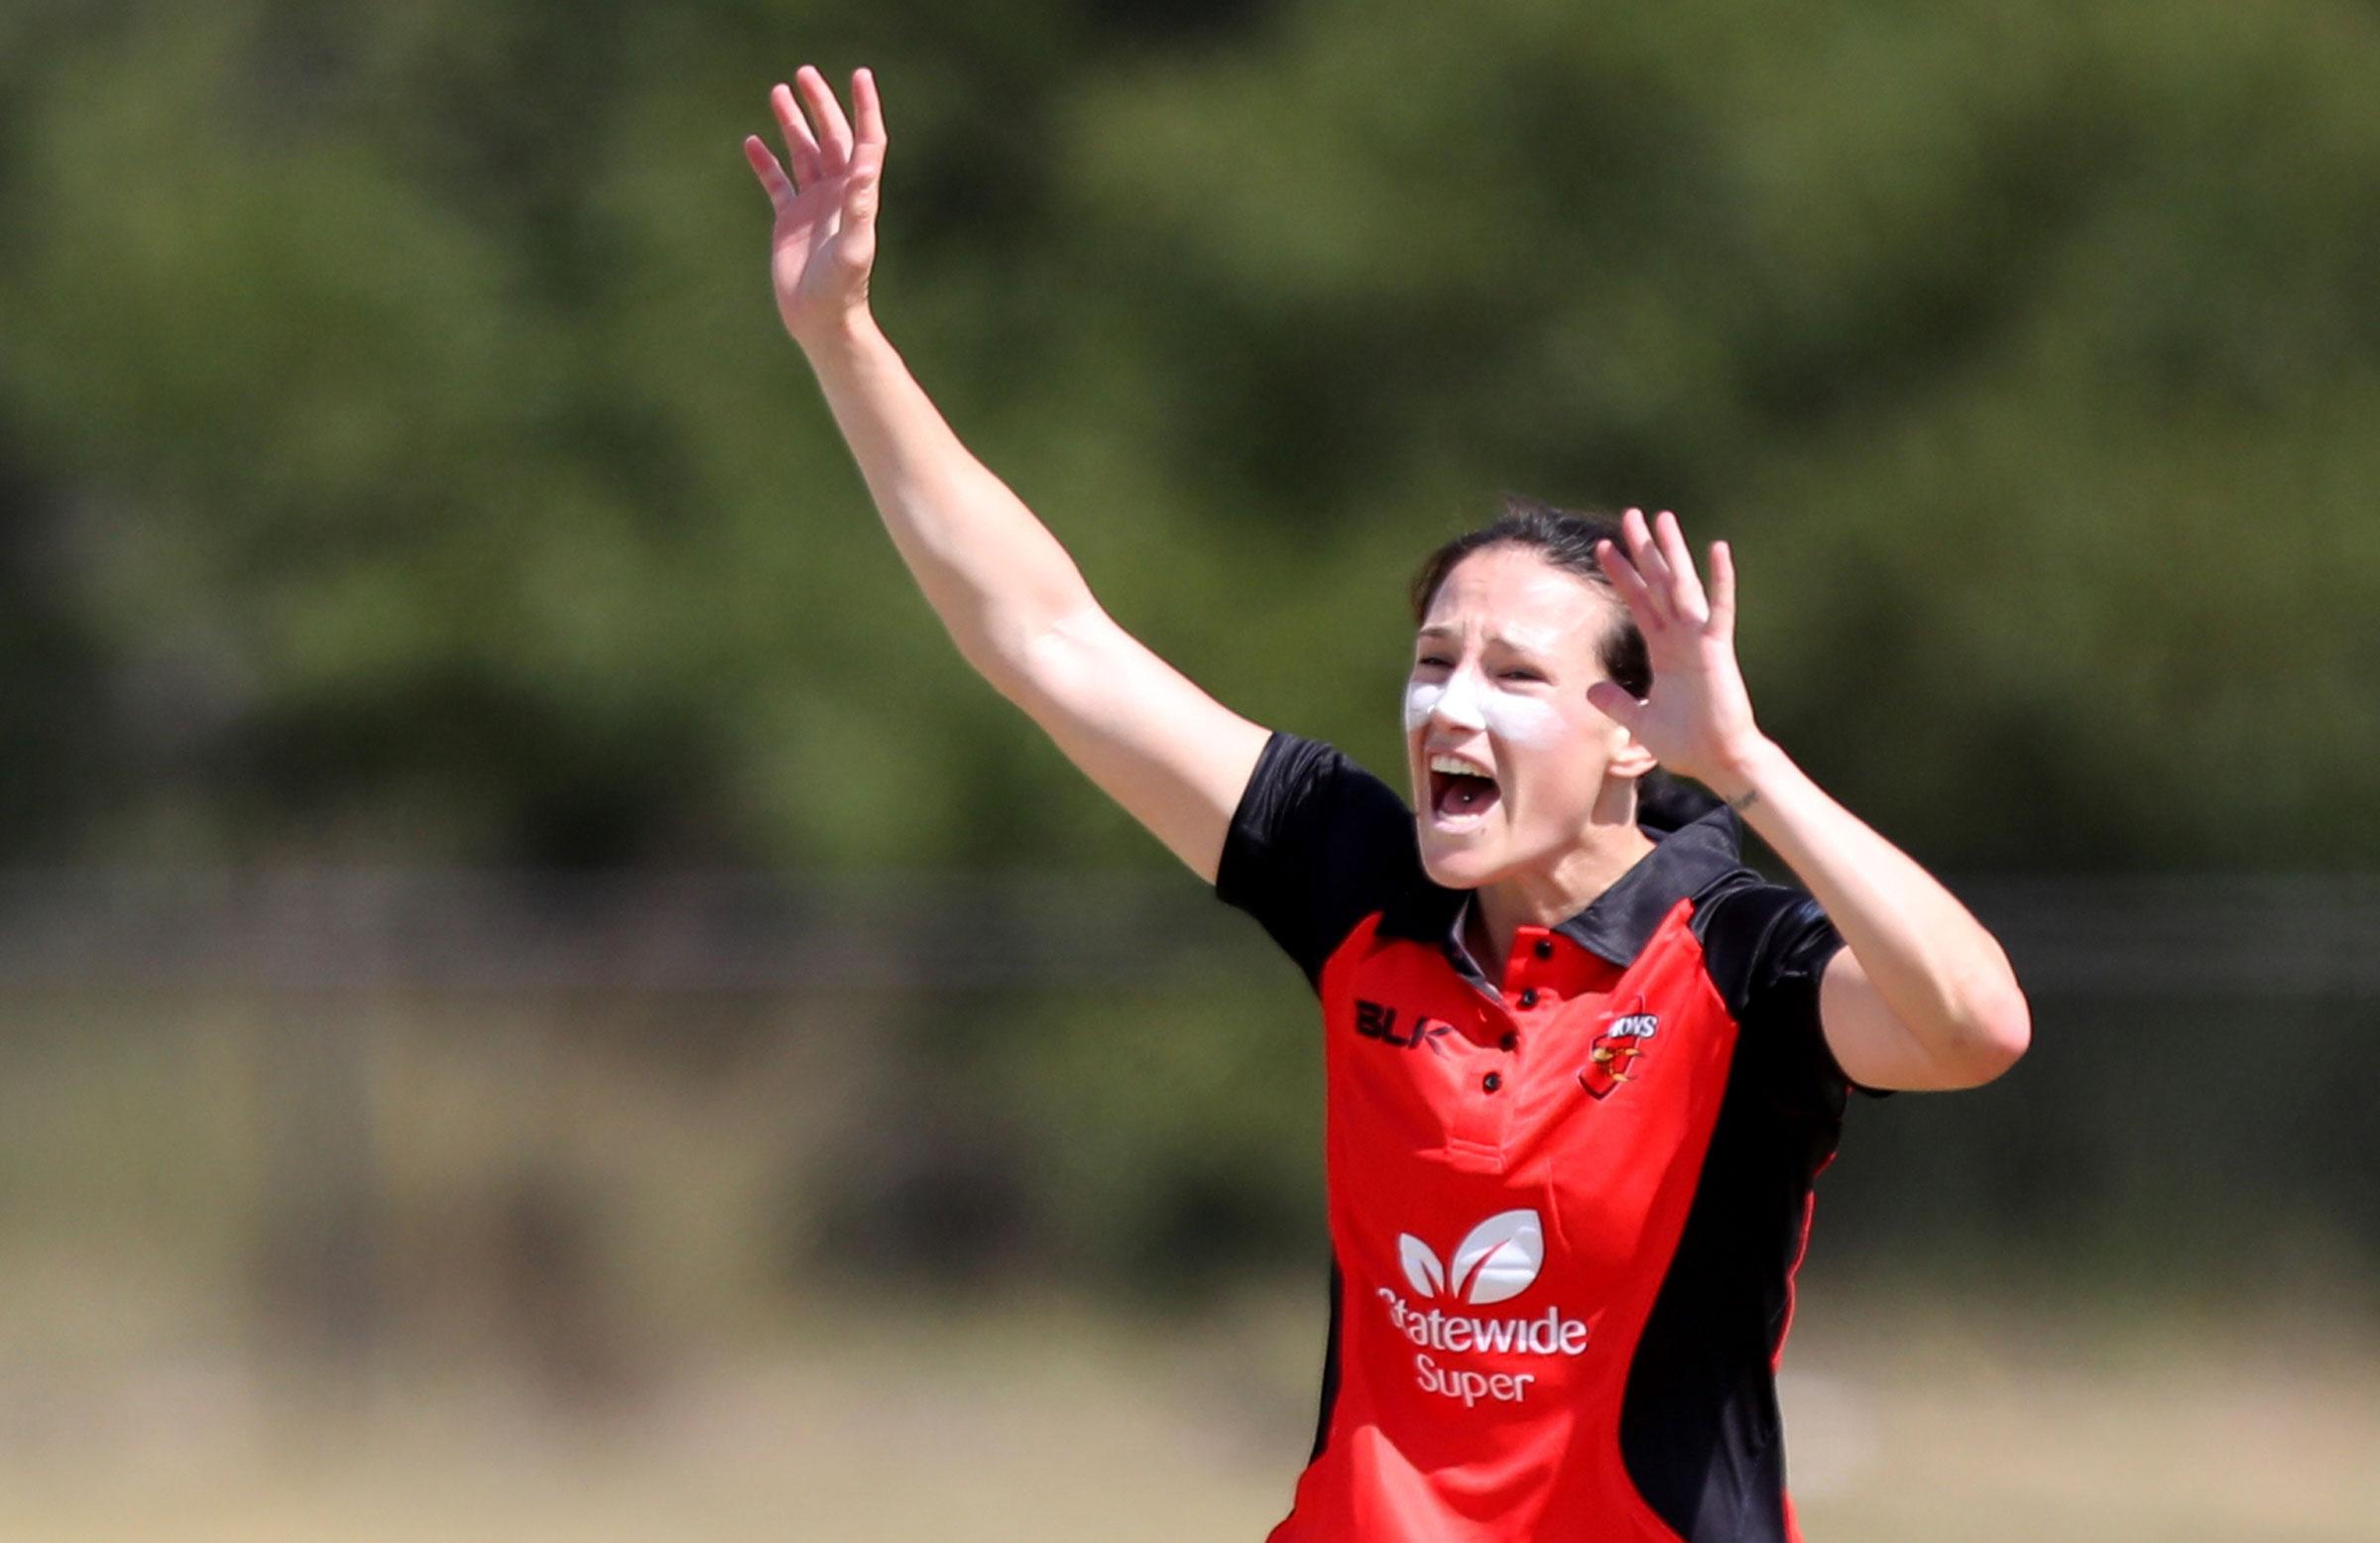 South Australia skipper Megan Schutt will be a key part of Australia's bowling attack // AAP